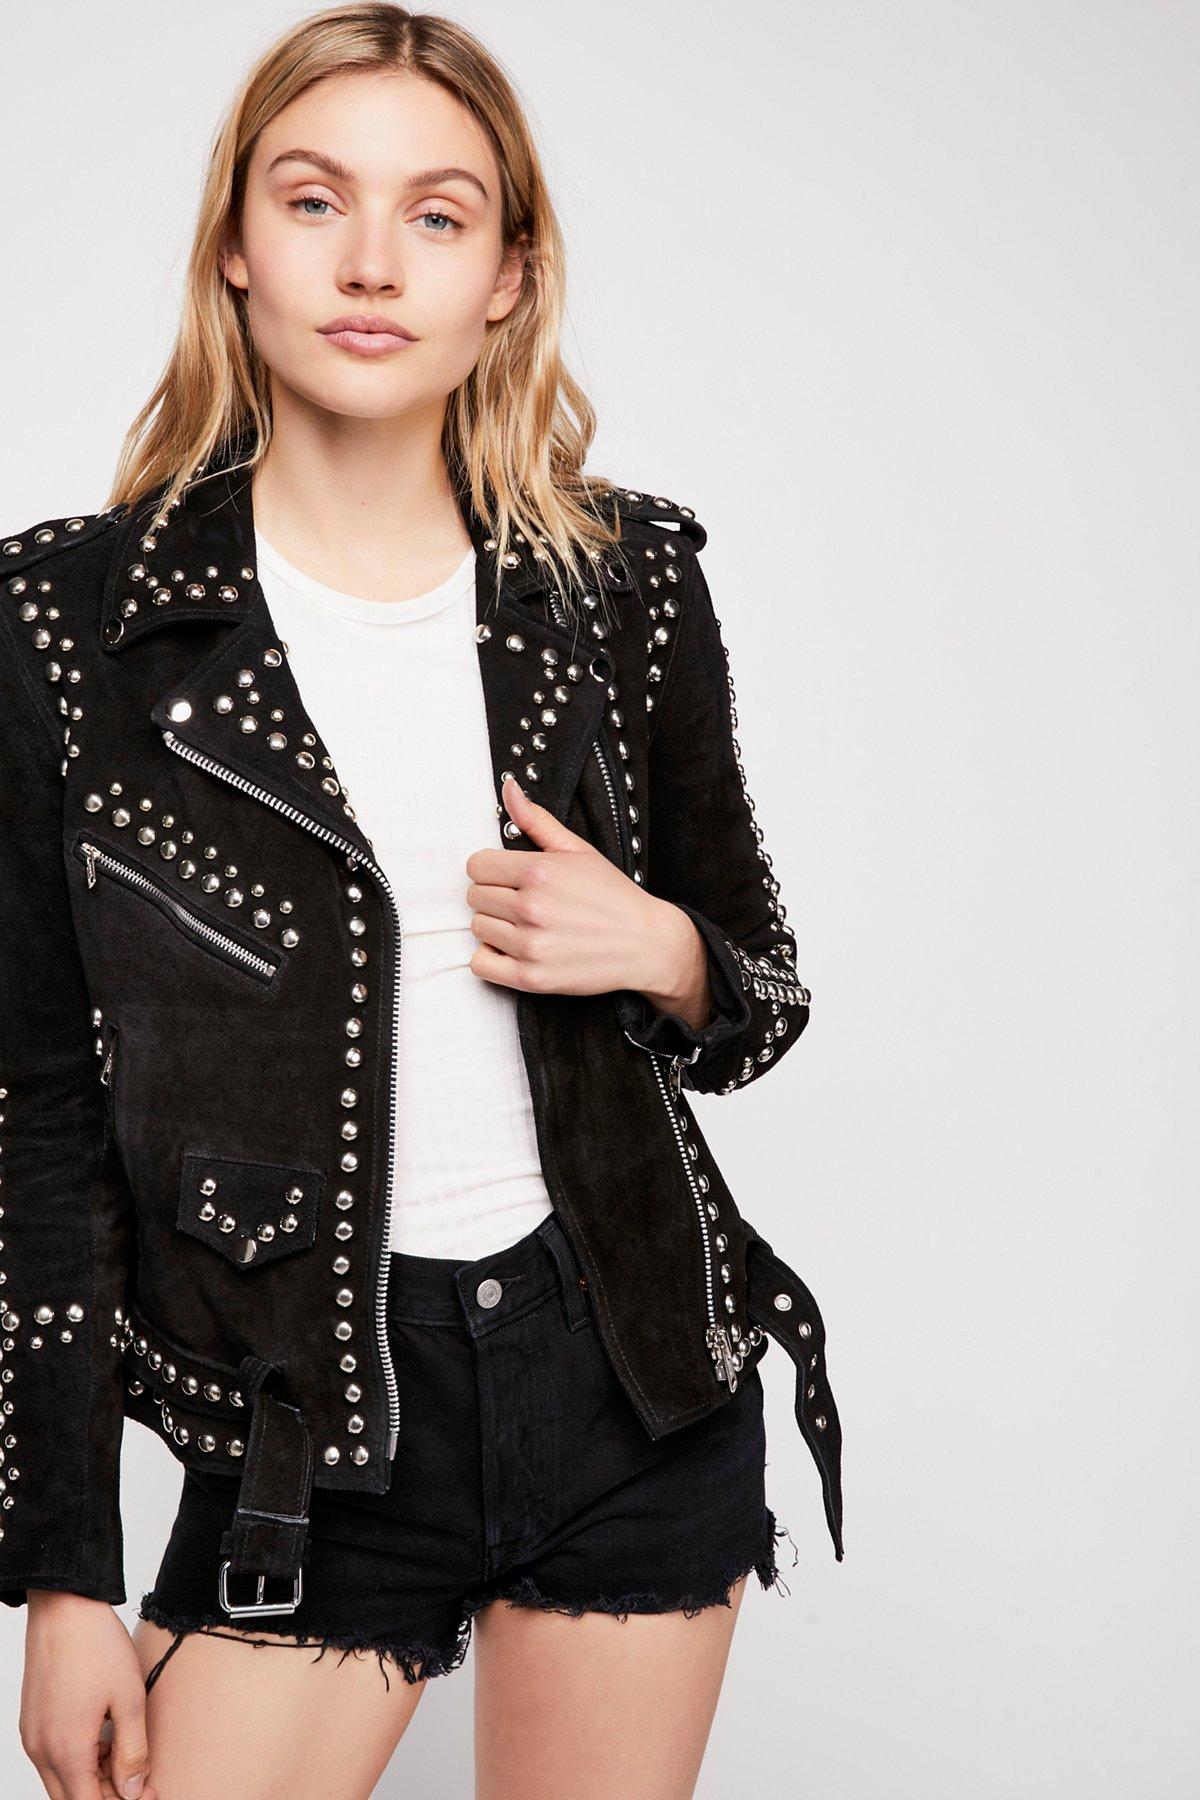 Studded Easy Rider Jacket